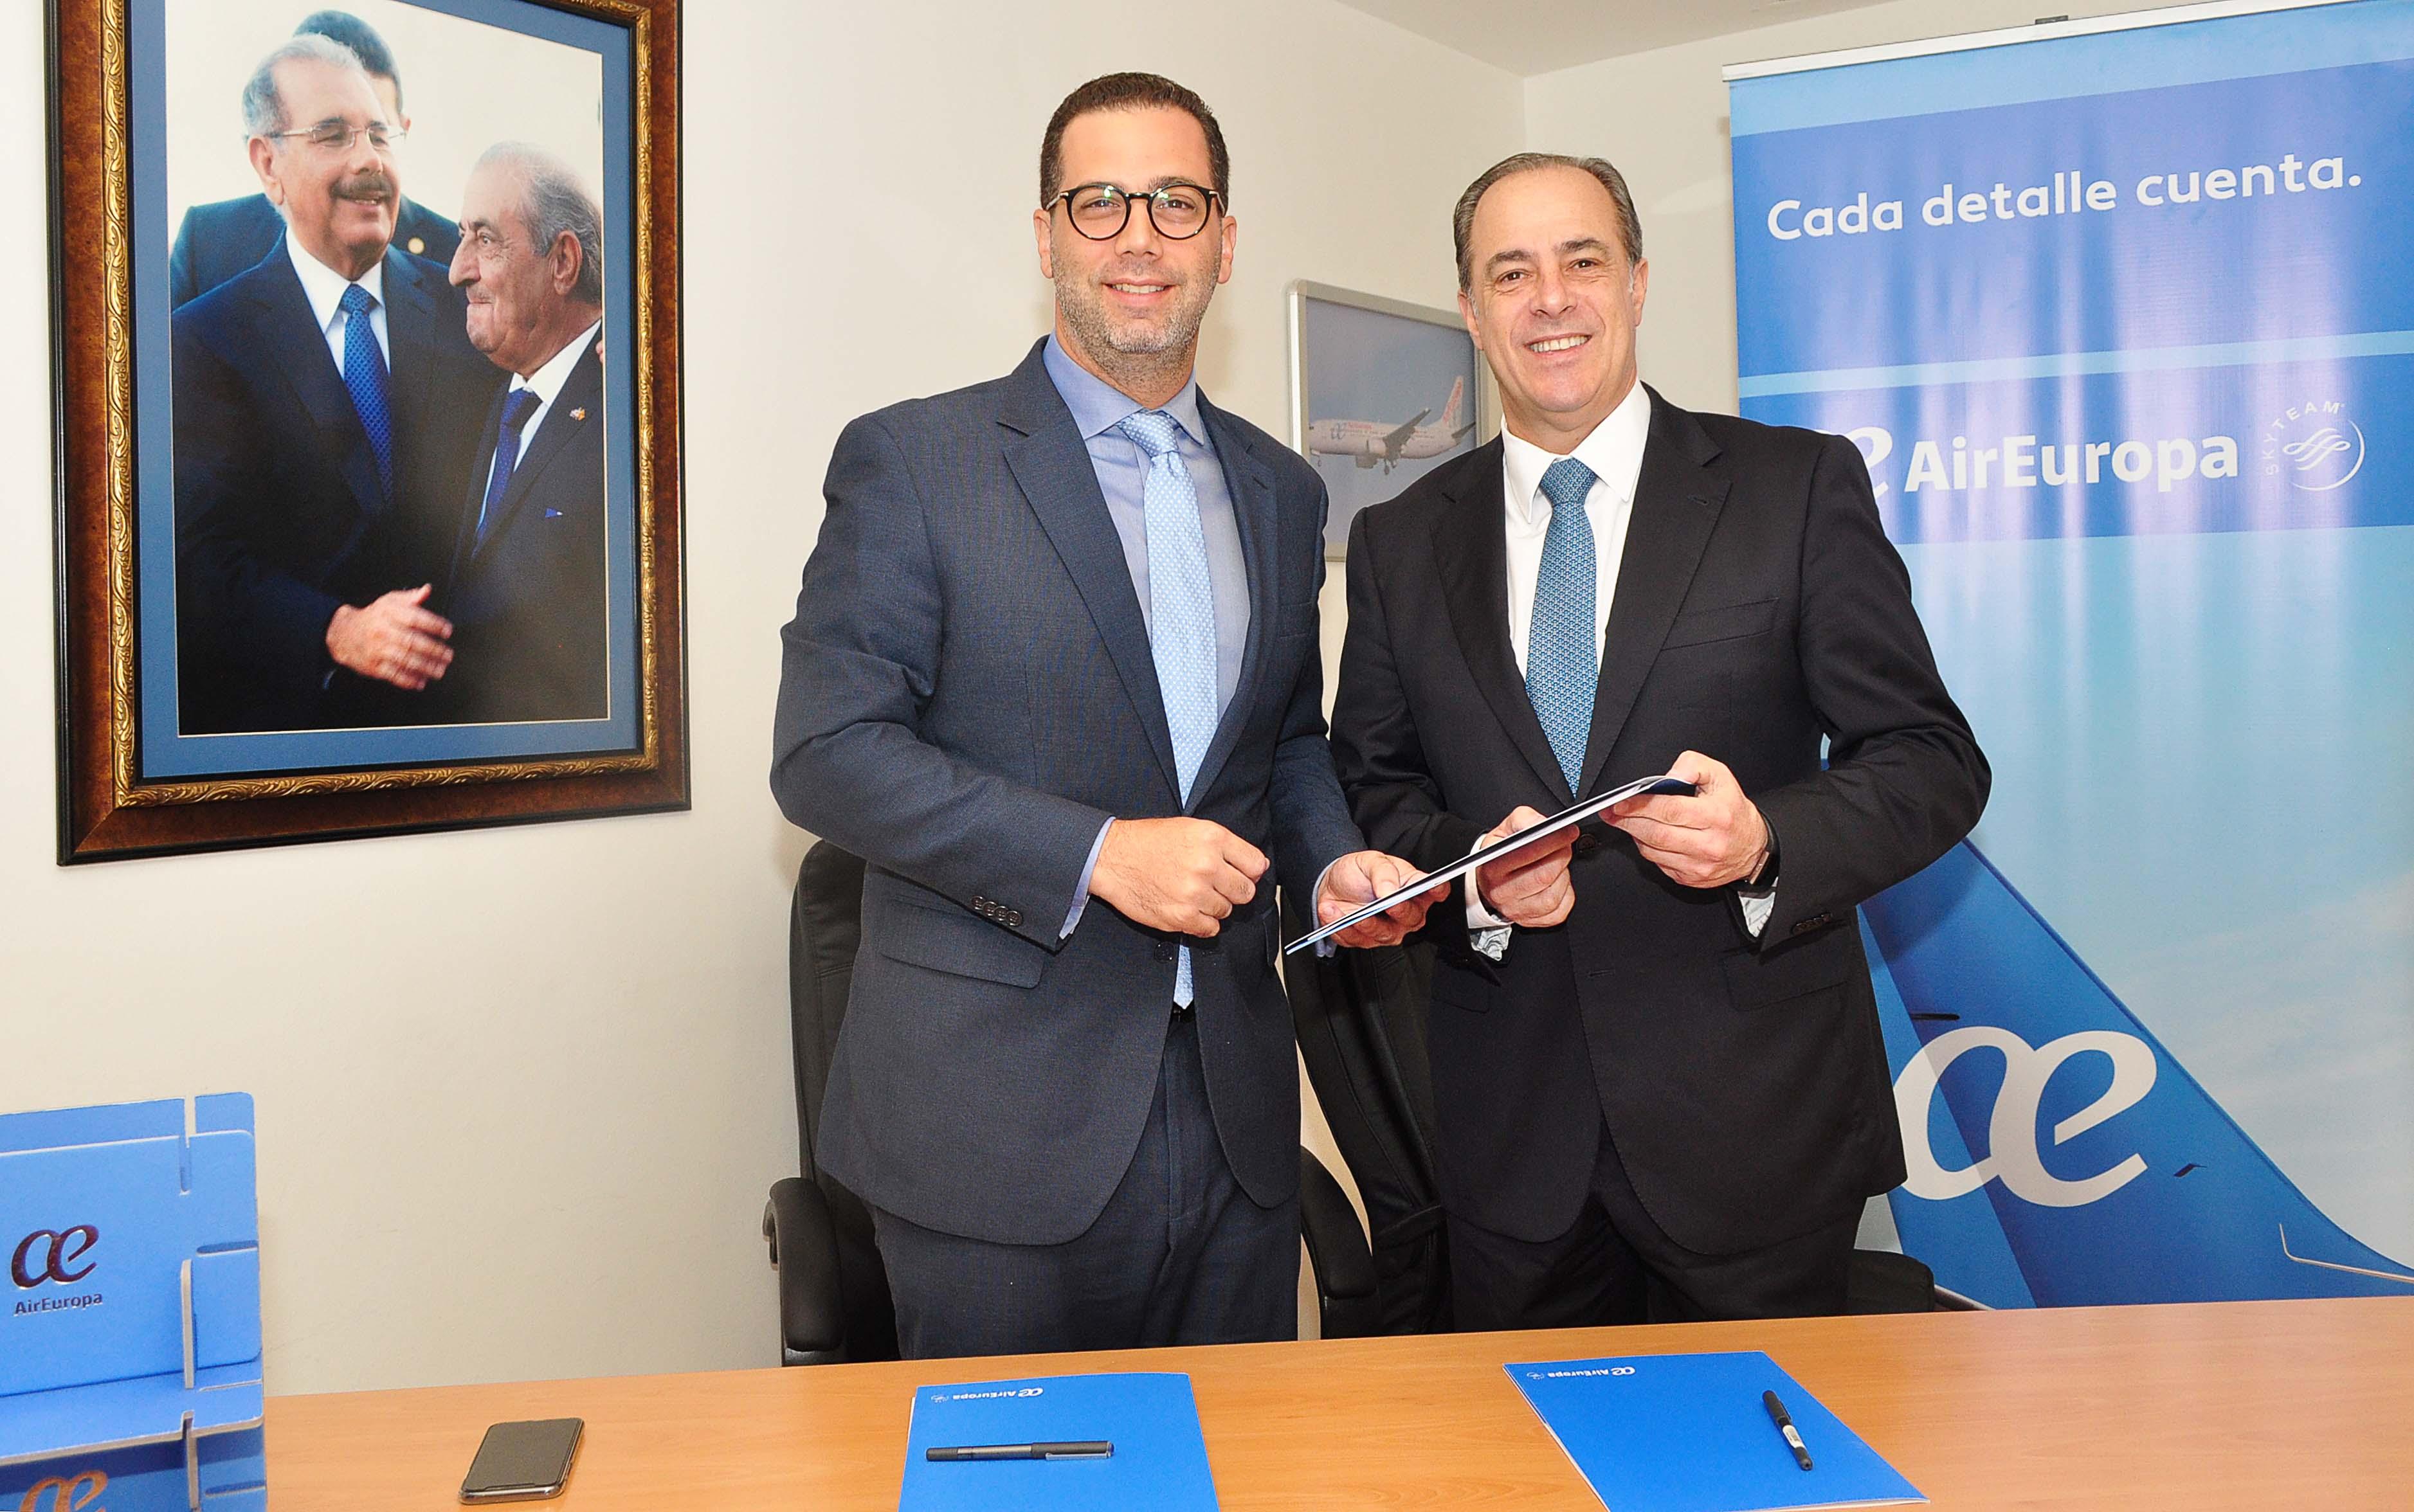 Air Europa acuerda ser línea oficial de la Selección Nacional de Fútbol